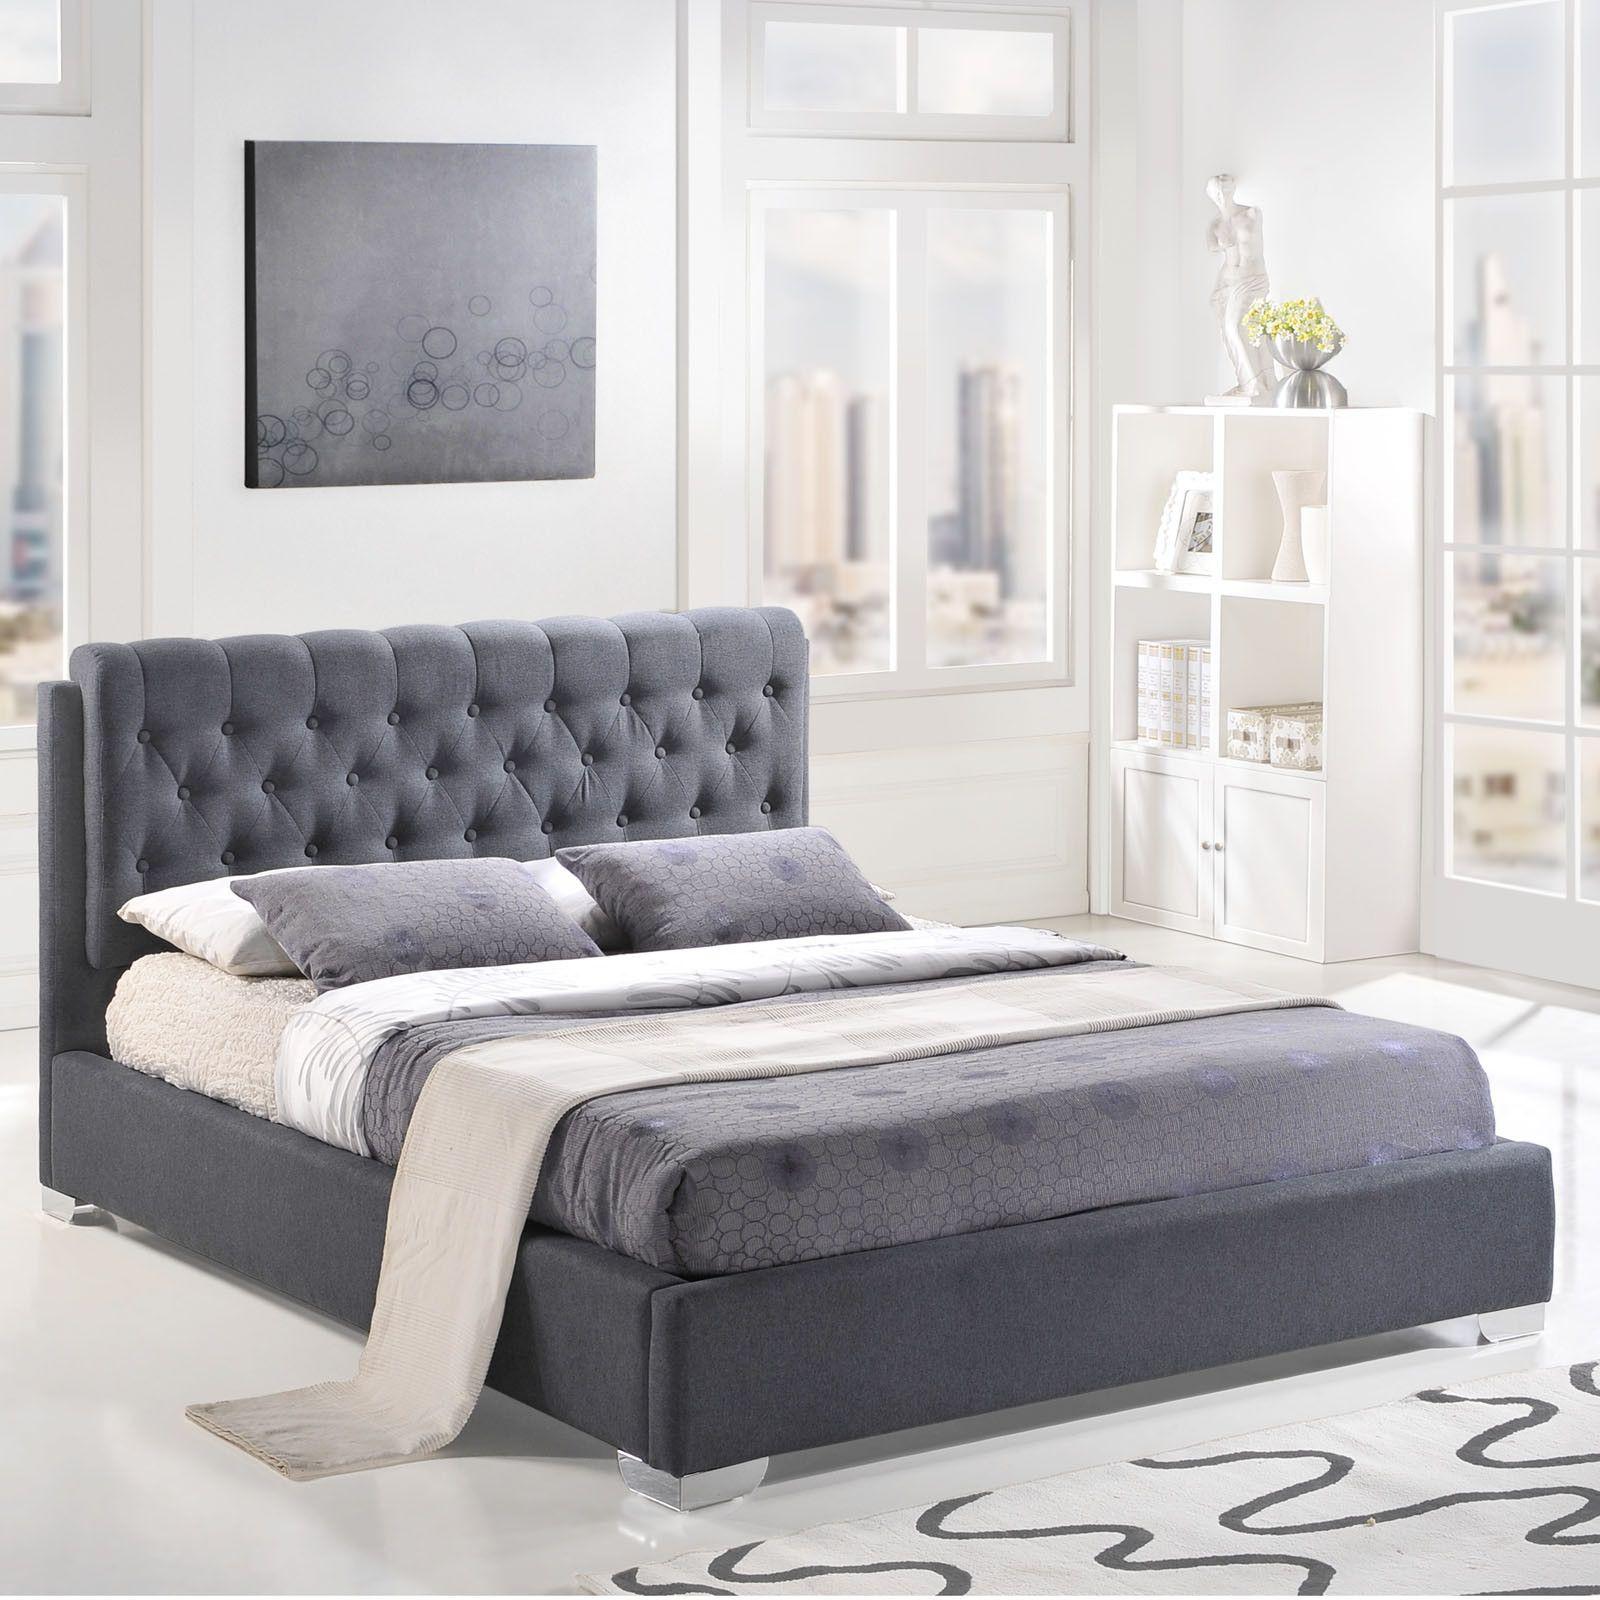 Modway Amelia Queen Bed AllModern TSC Austin Bedroom